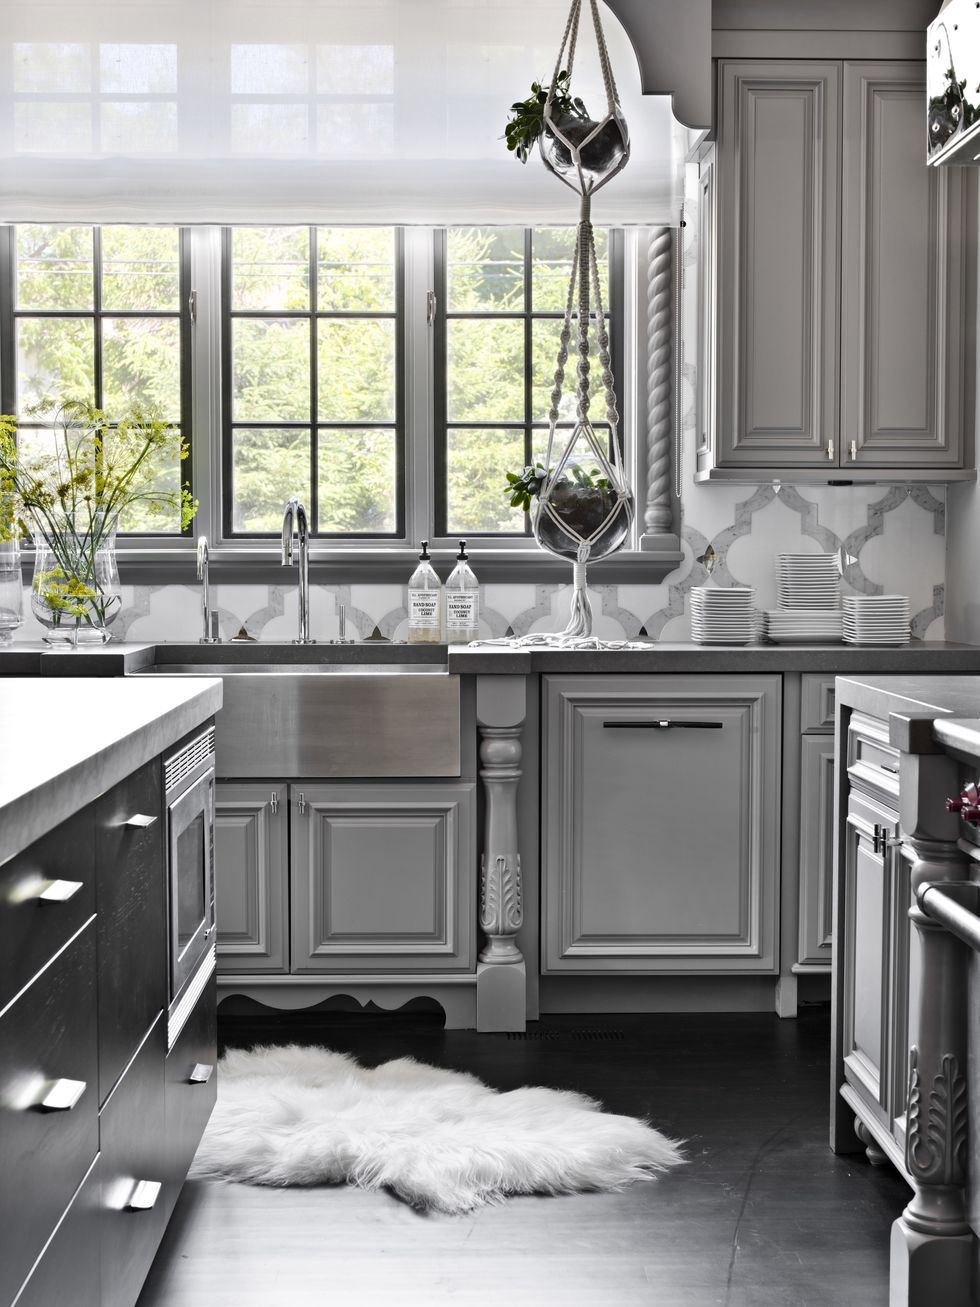 & 20 Gorgeous Kitchen Tile Backsplashes - Best Kitchen Tile Ideas